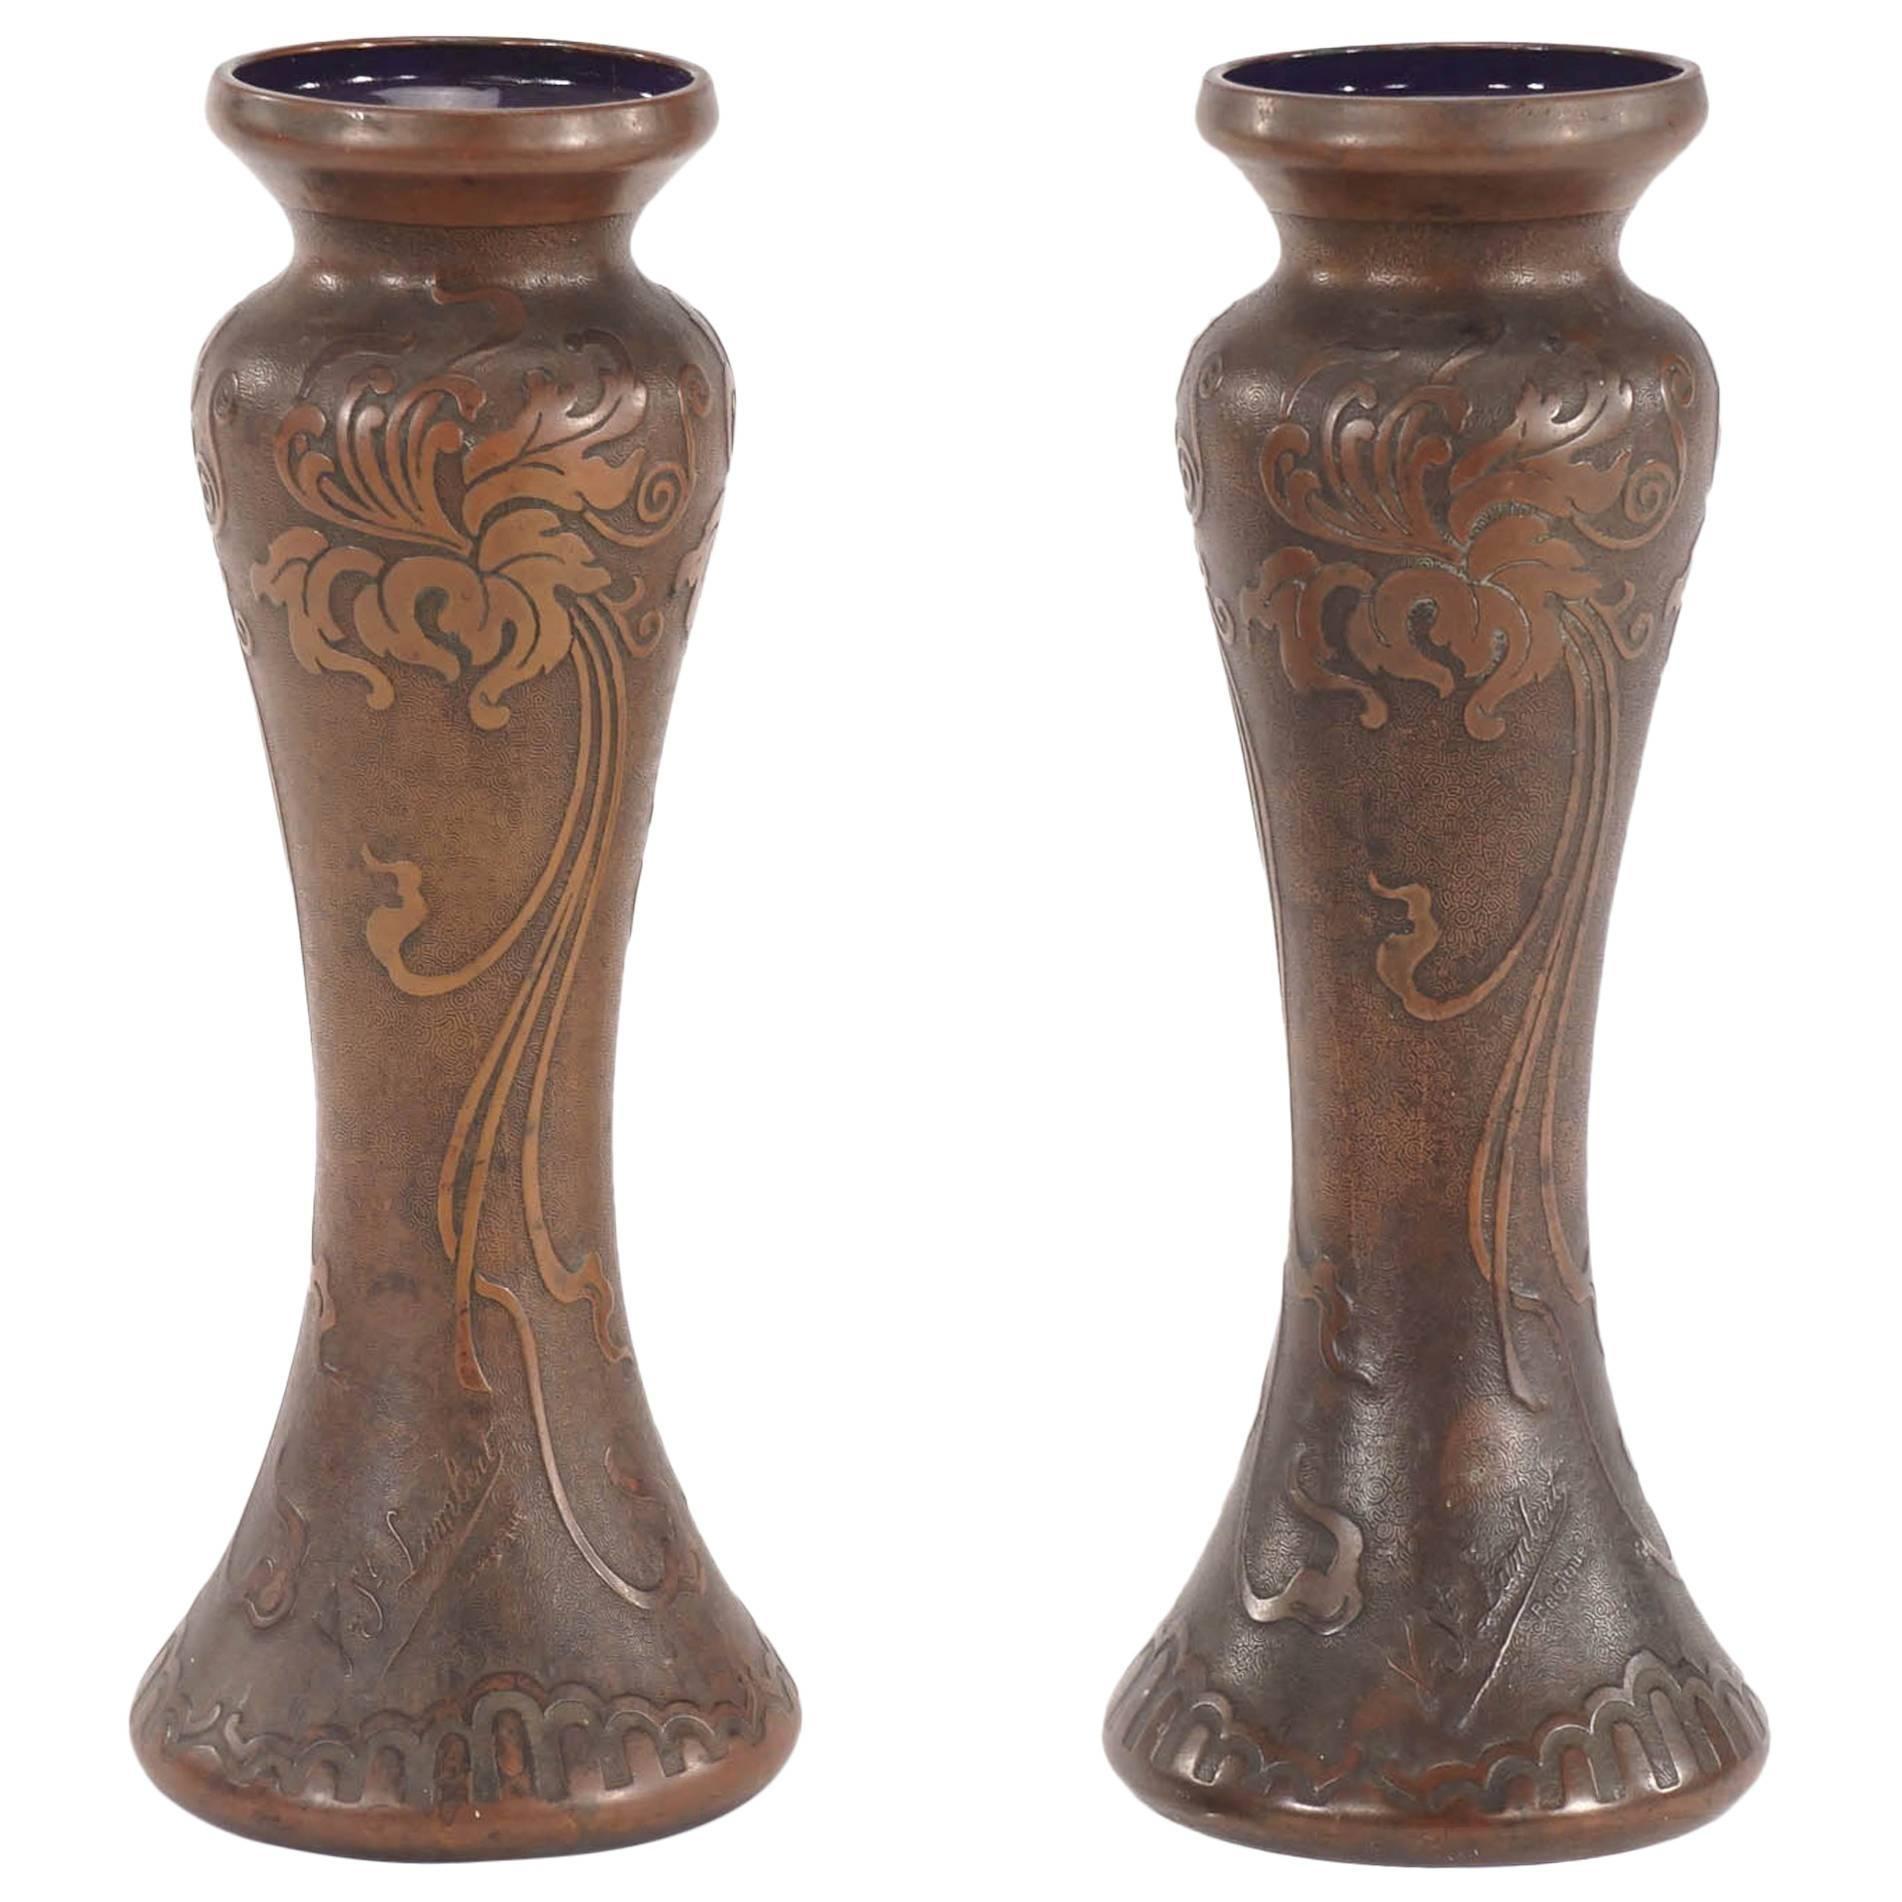 Pair of Signed Val Saint Lambert Amethyst Art Nouveau Vases with Bronze Patina